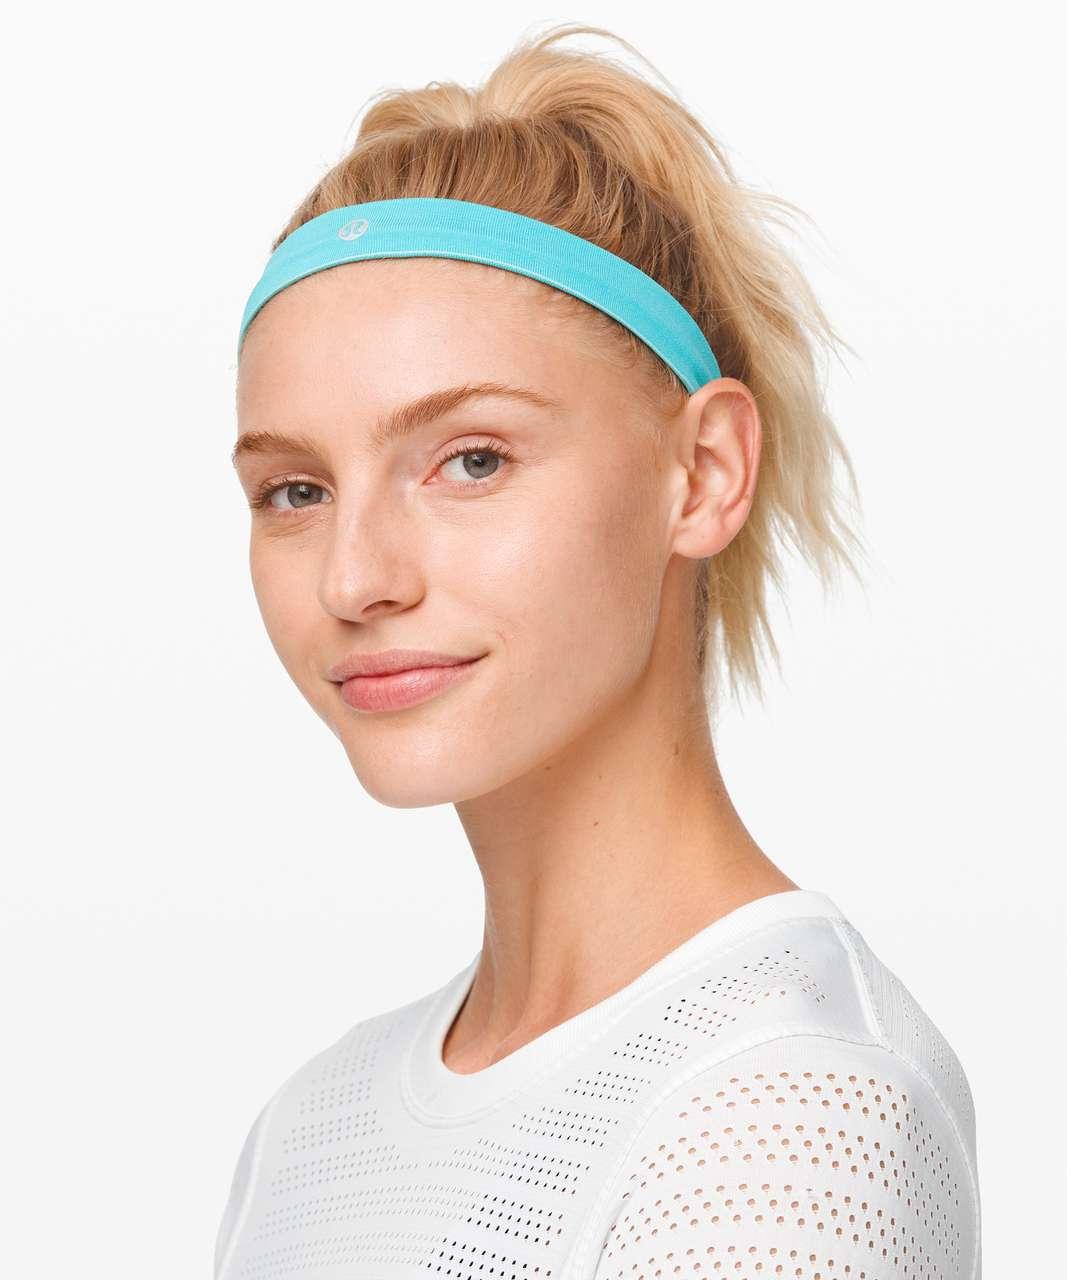 Lululemon Cardio Cross Trainer Headband - Aqua Glow / Aqua Aura